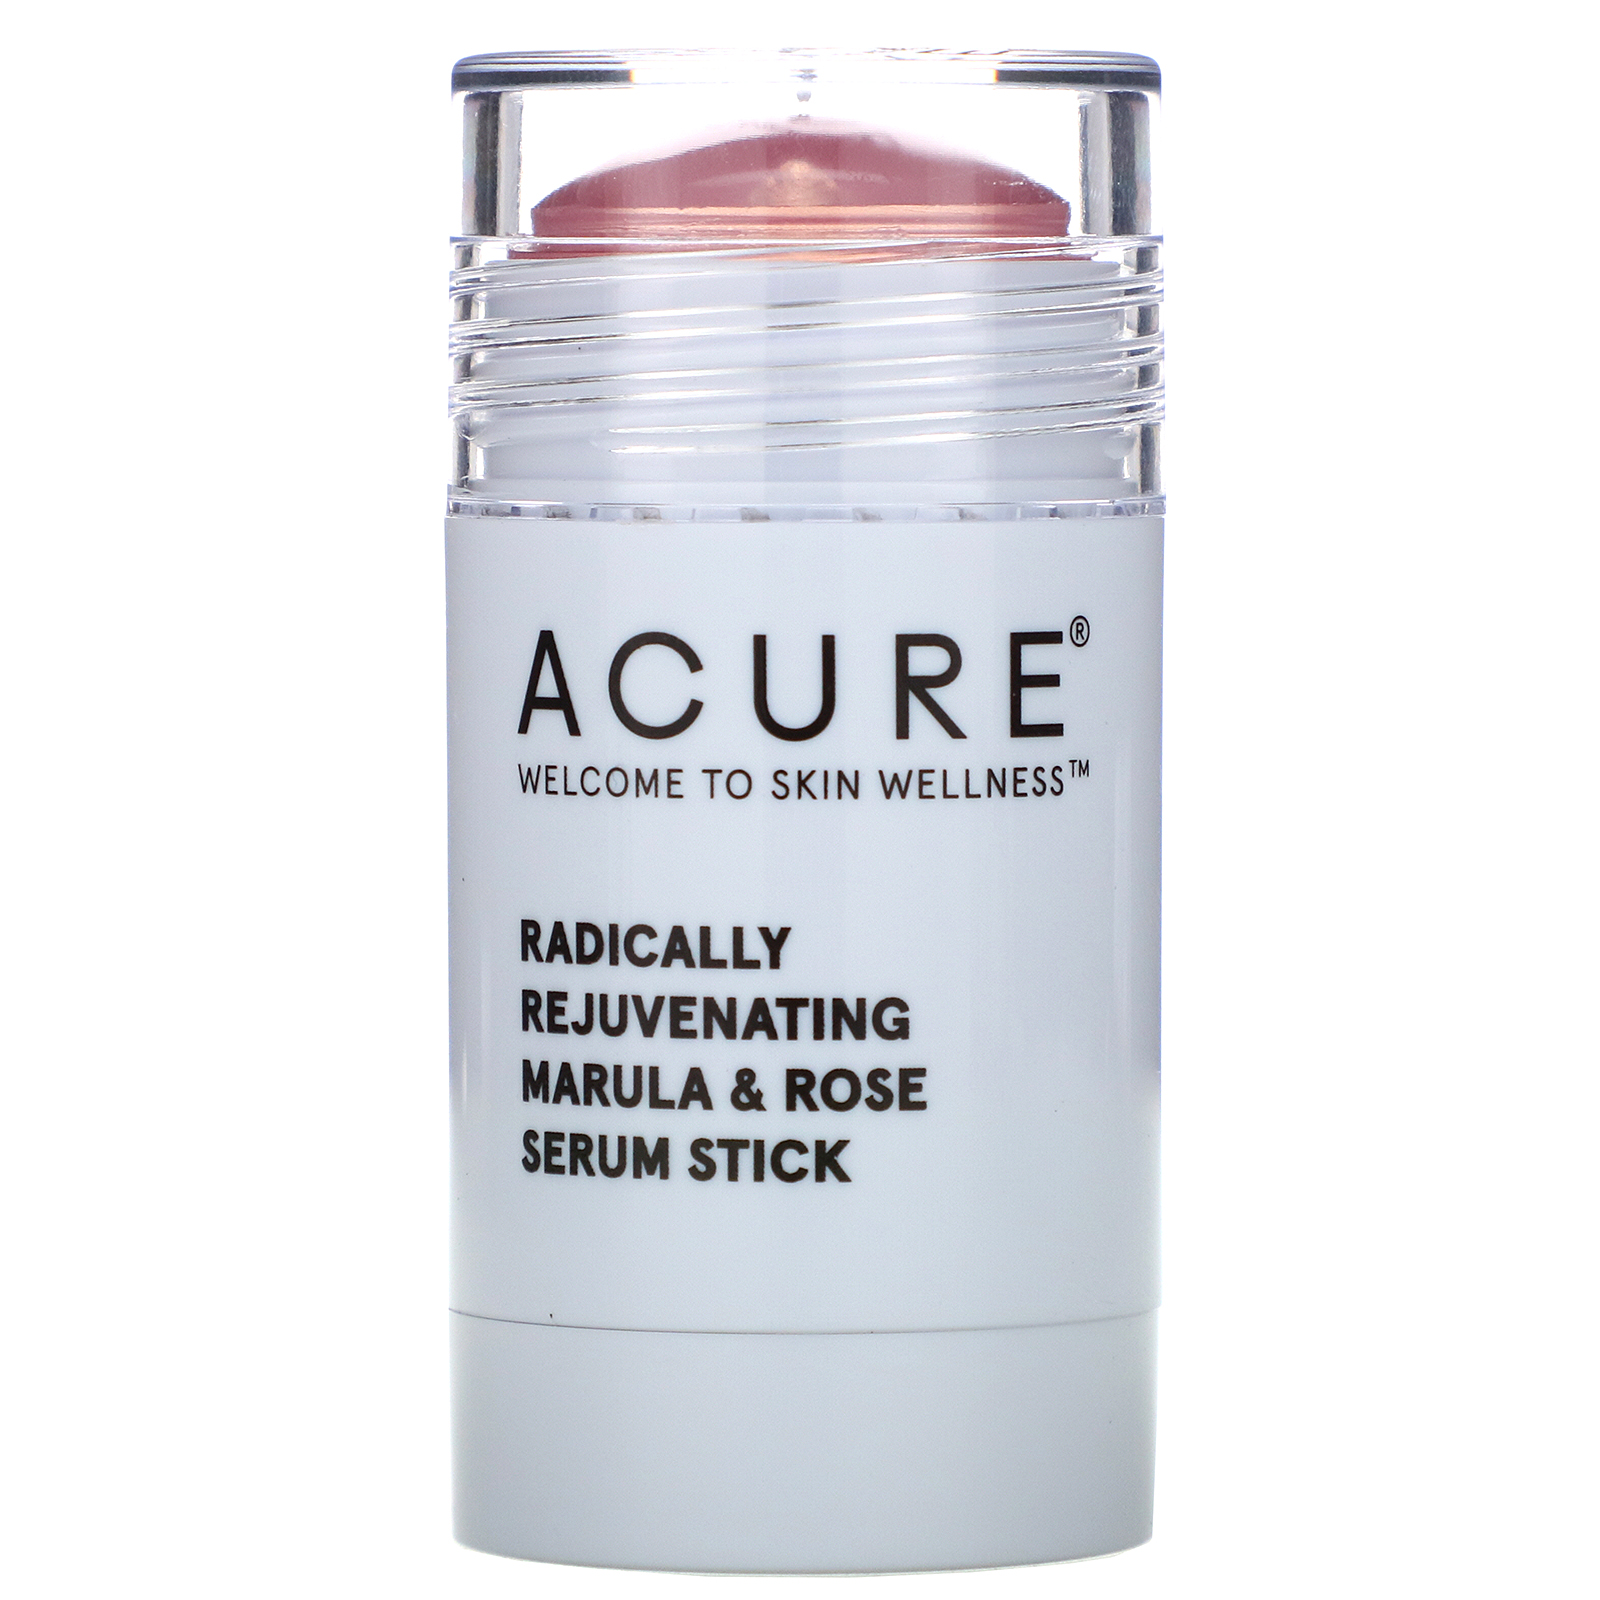 Acure, Radically Rejuvenating, Serum Stick, 1 Oz (28.34 G